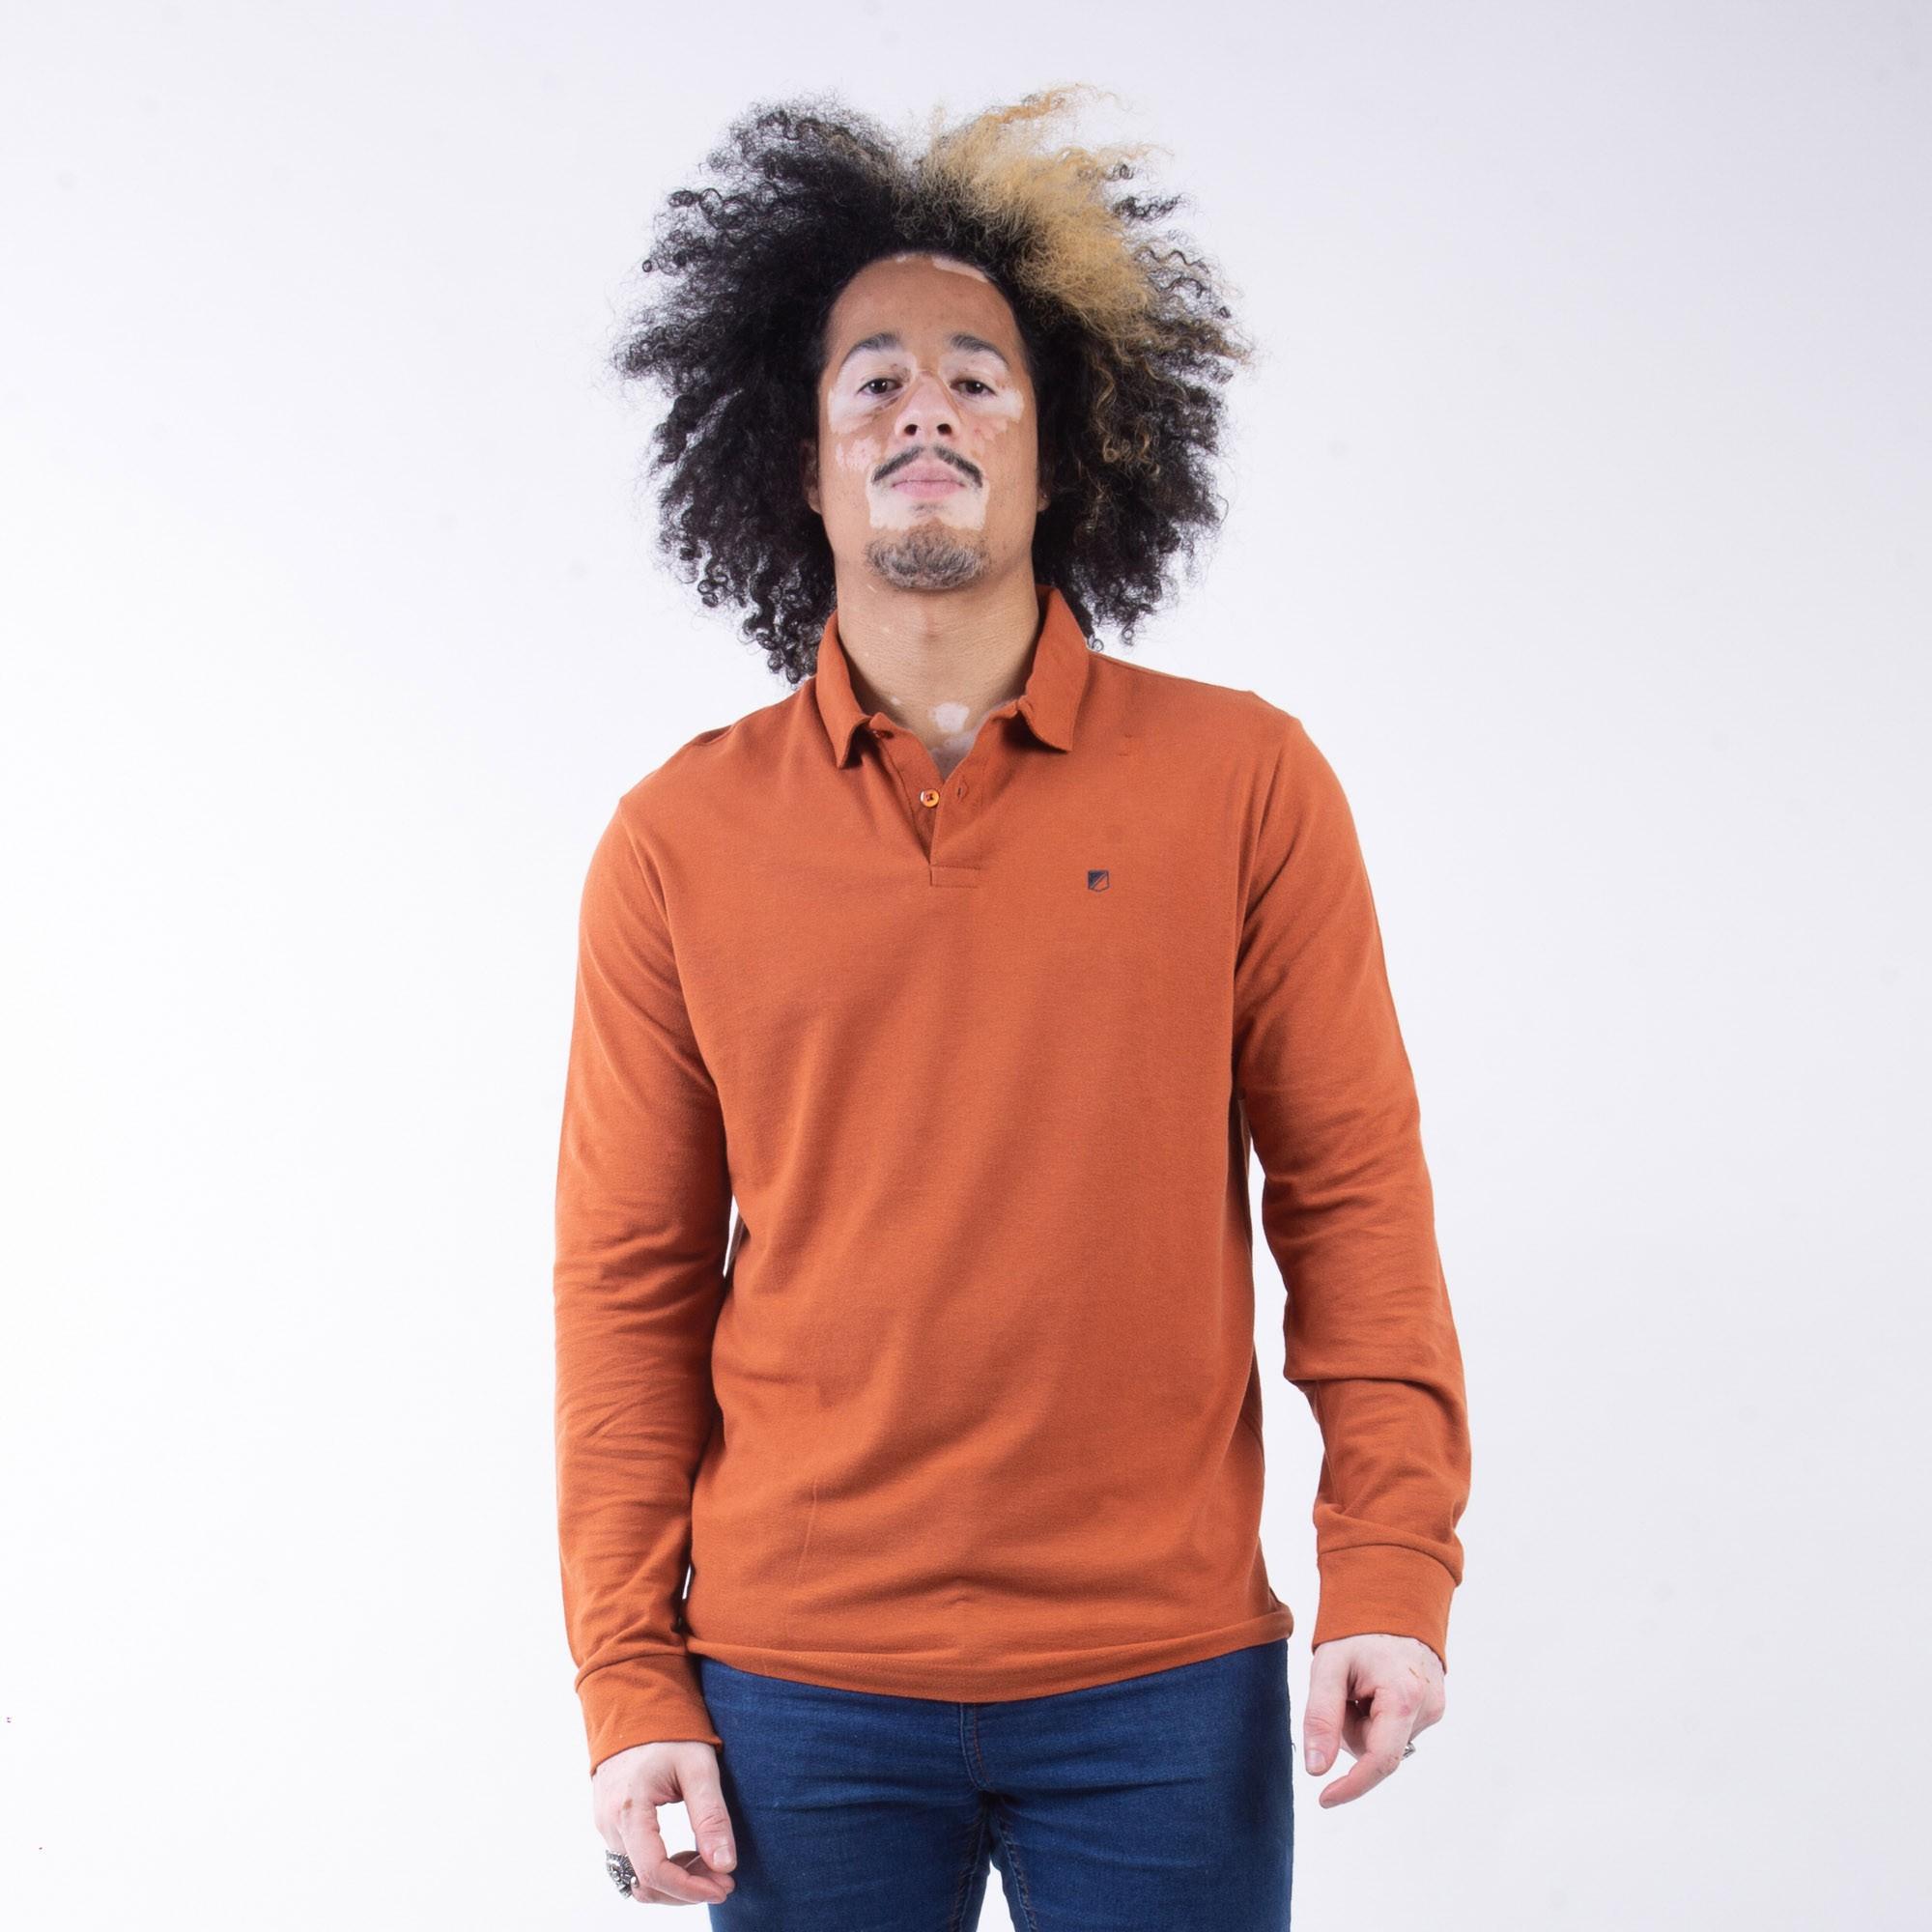 Camiseta Polo Masculina Manga Longa